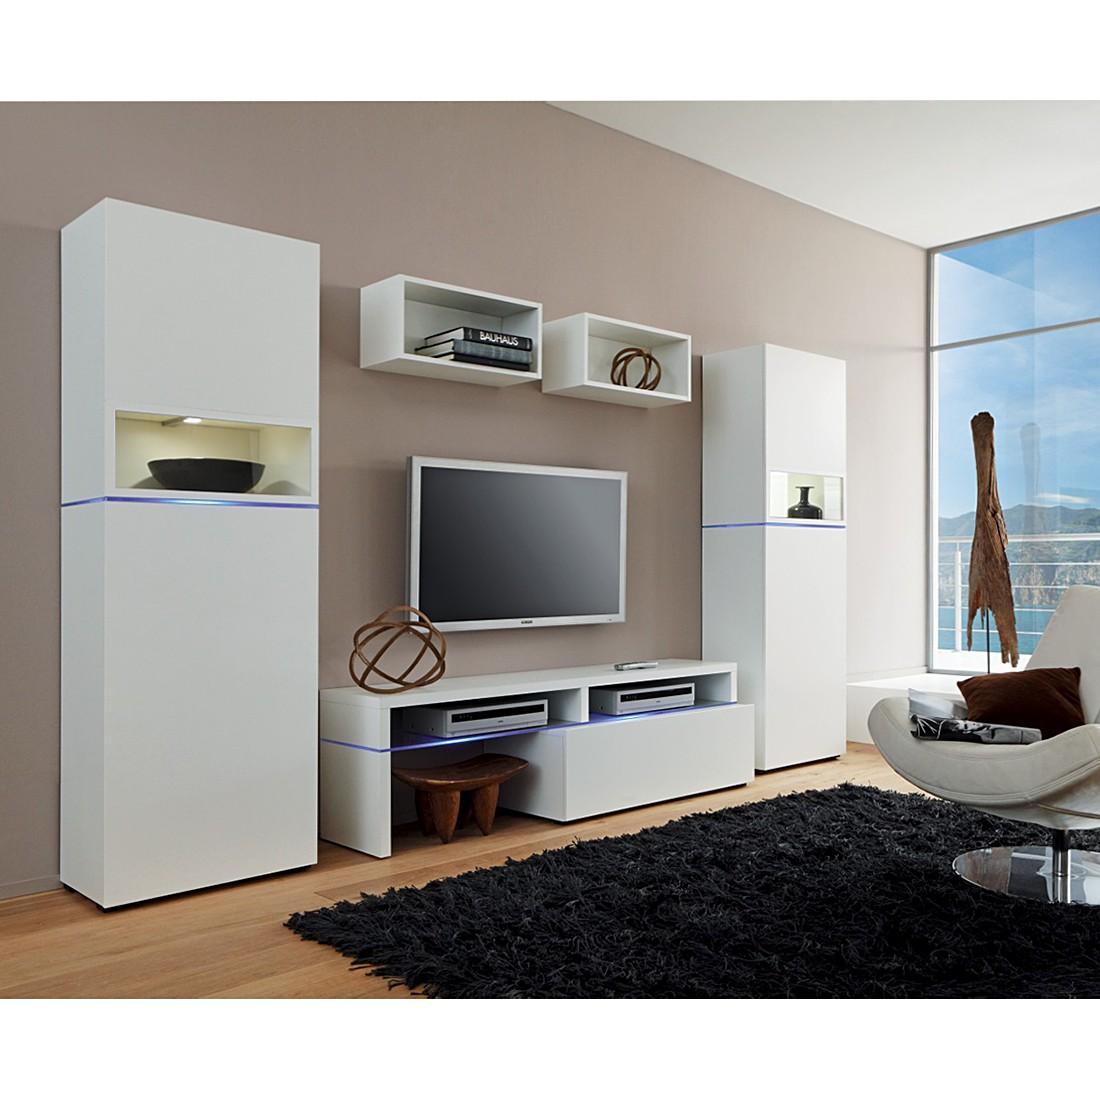 Wohnwand Elemente Style : Cs guide d achat